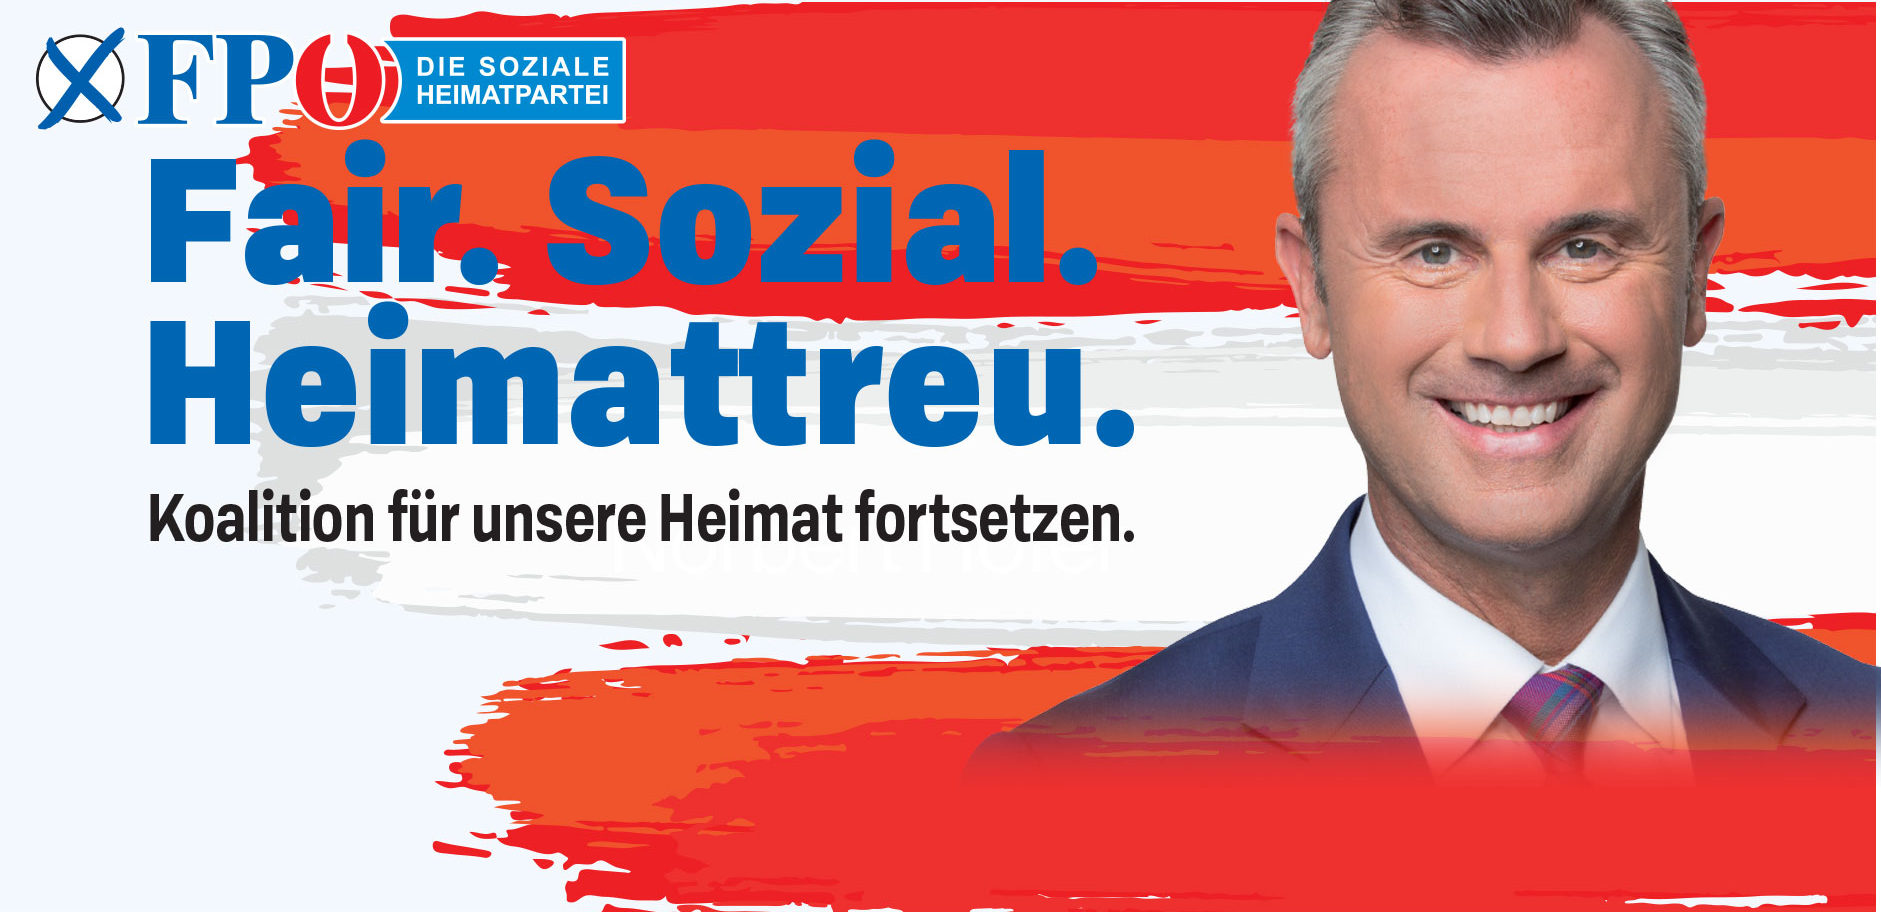 Wahlslogan 2019 der FPÖ: Fair Sozial Heimattreu